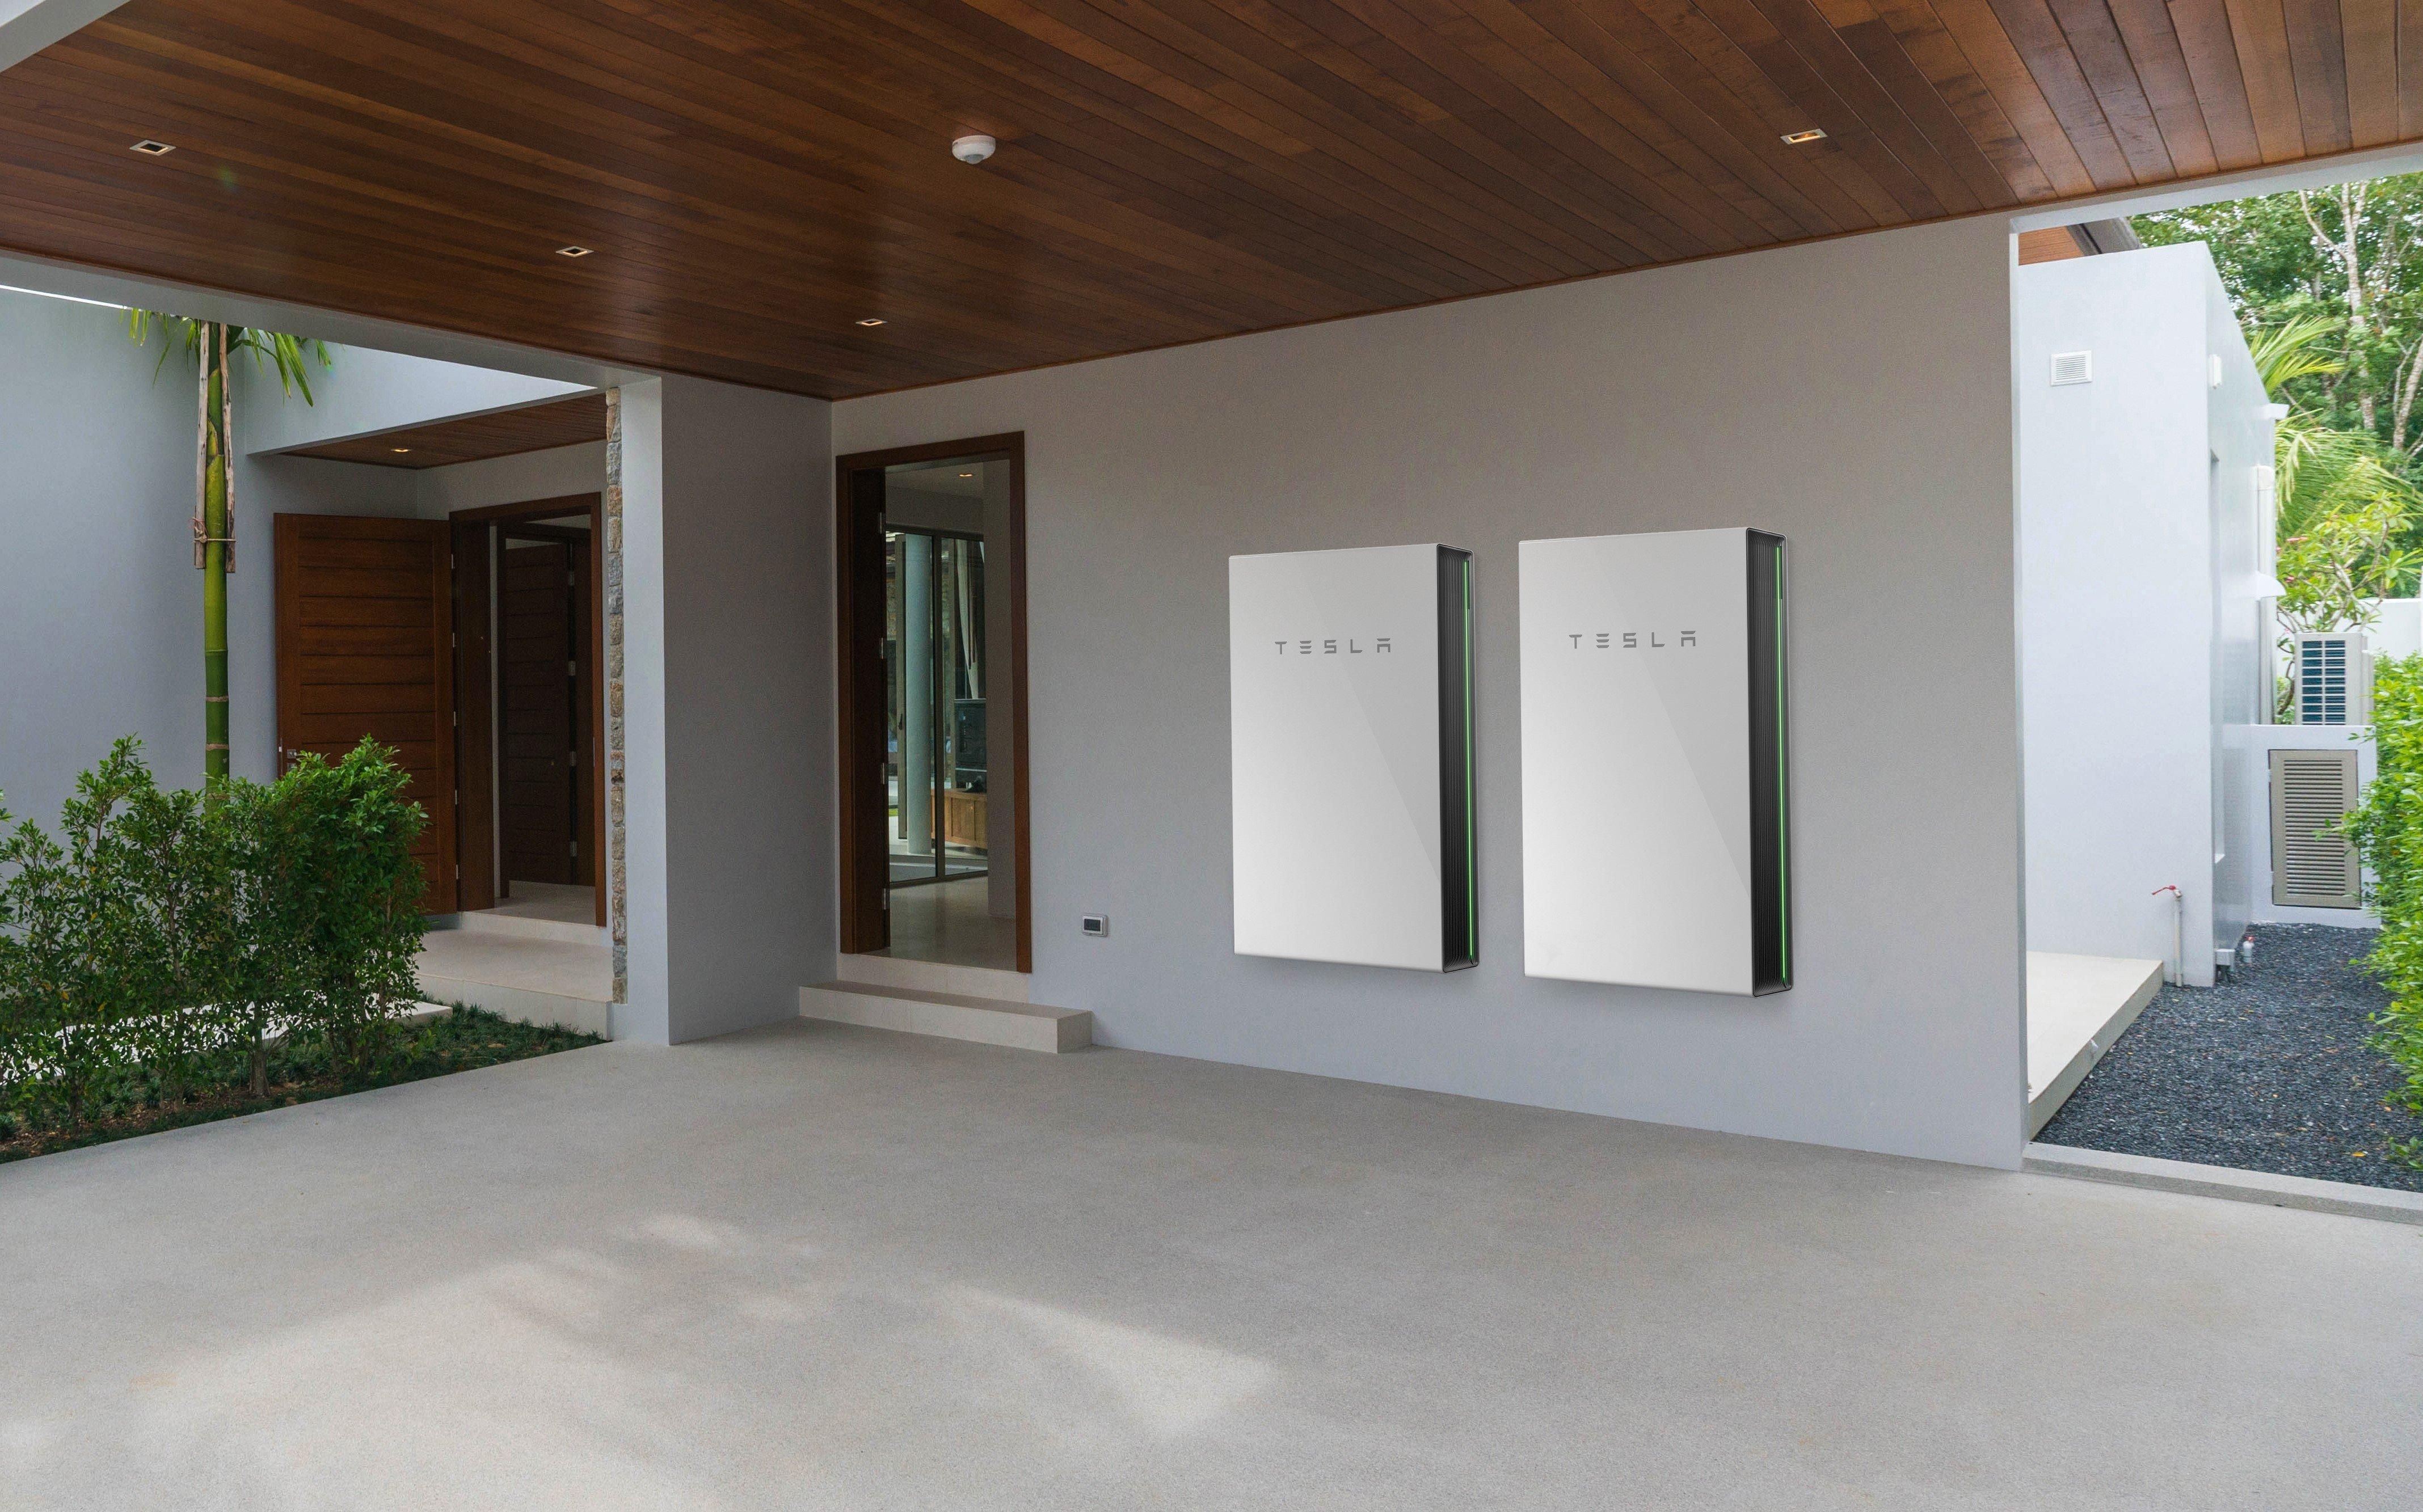 Two Tesla Powerwalls